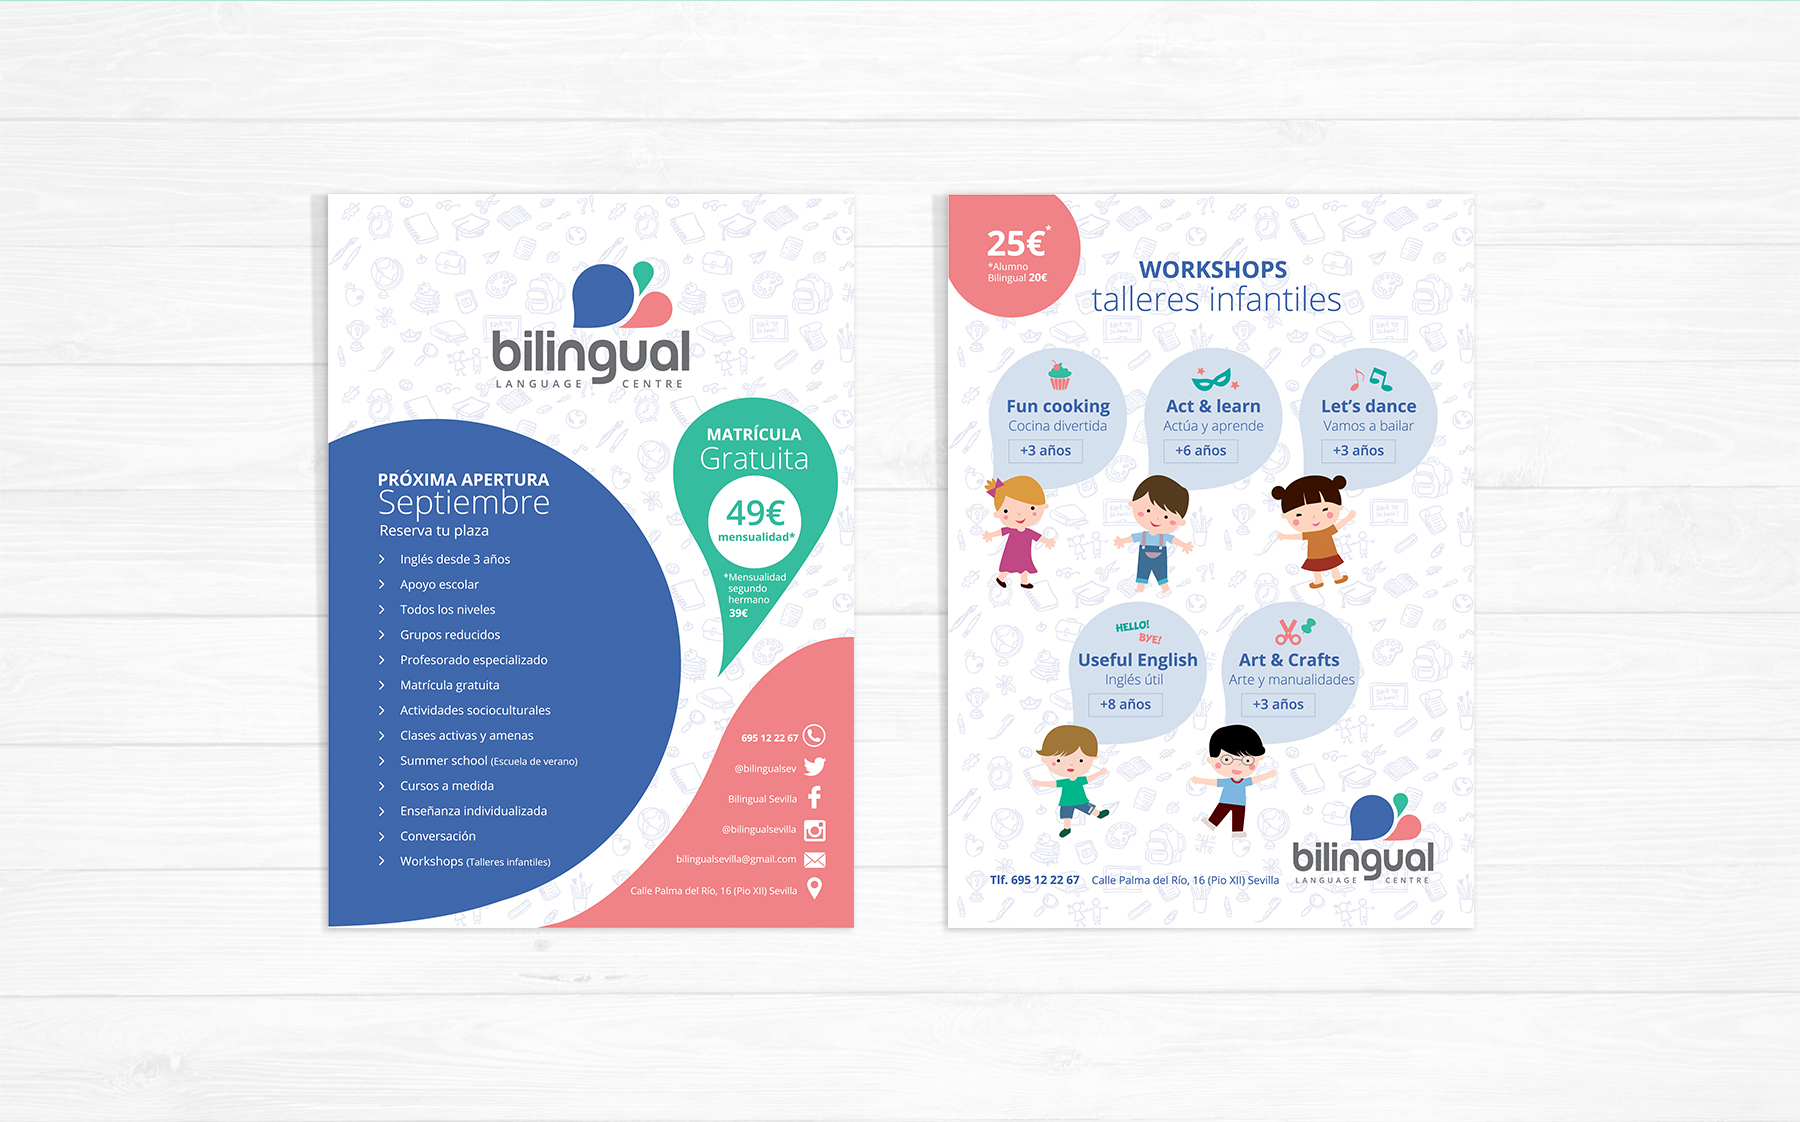 bilingual4